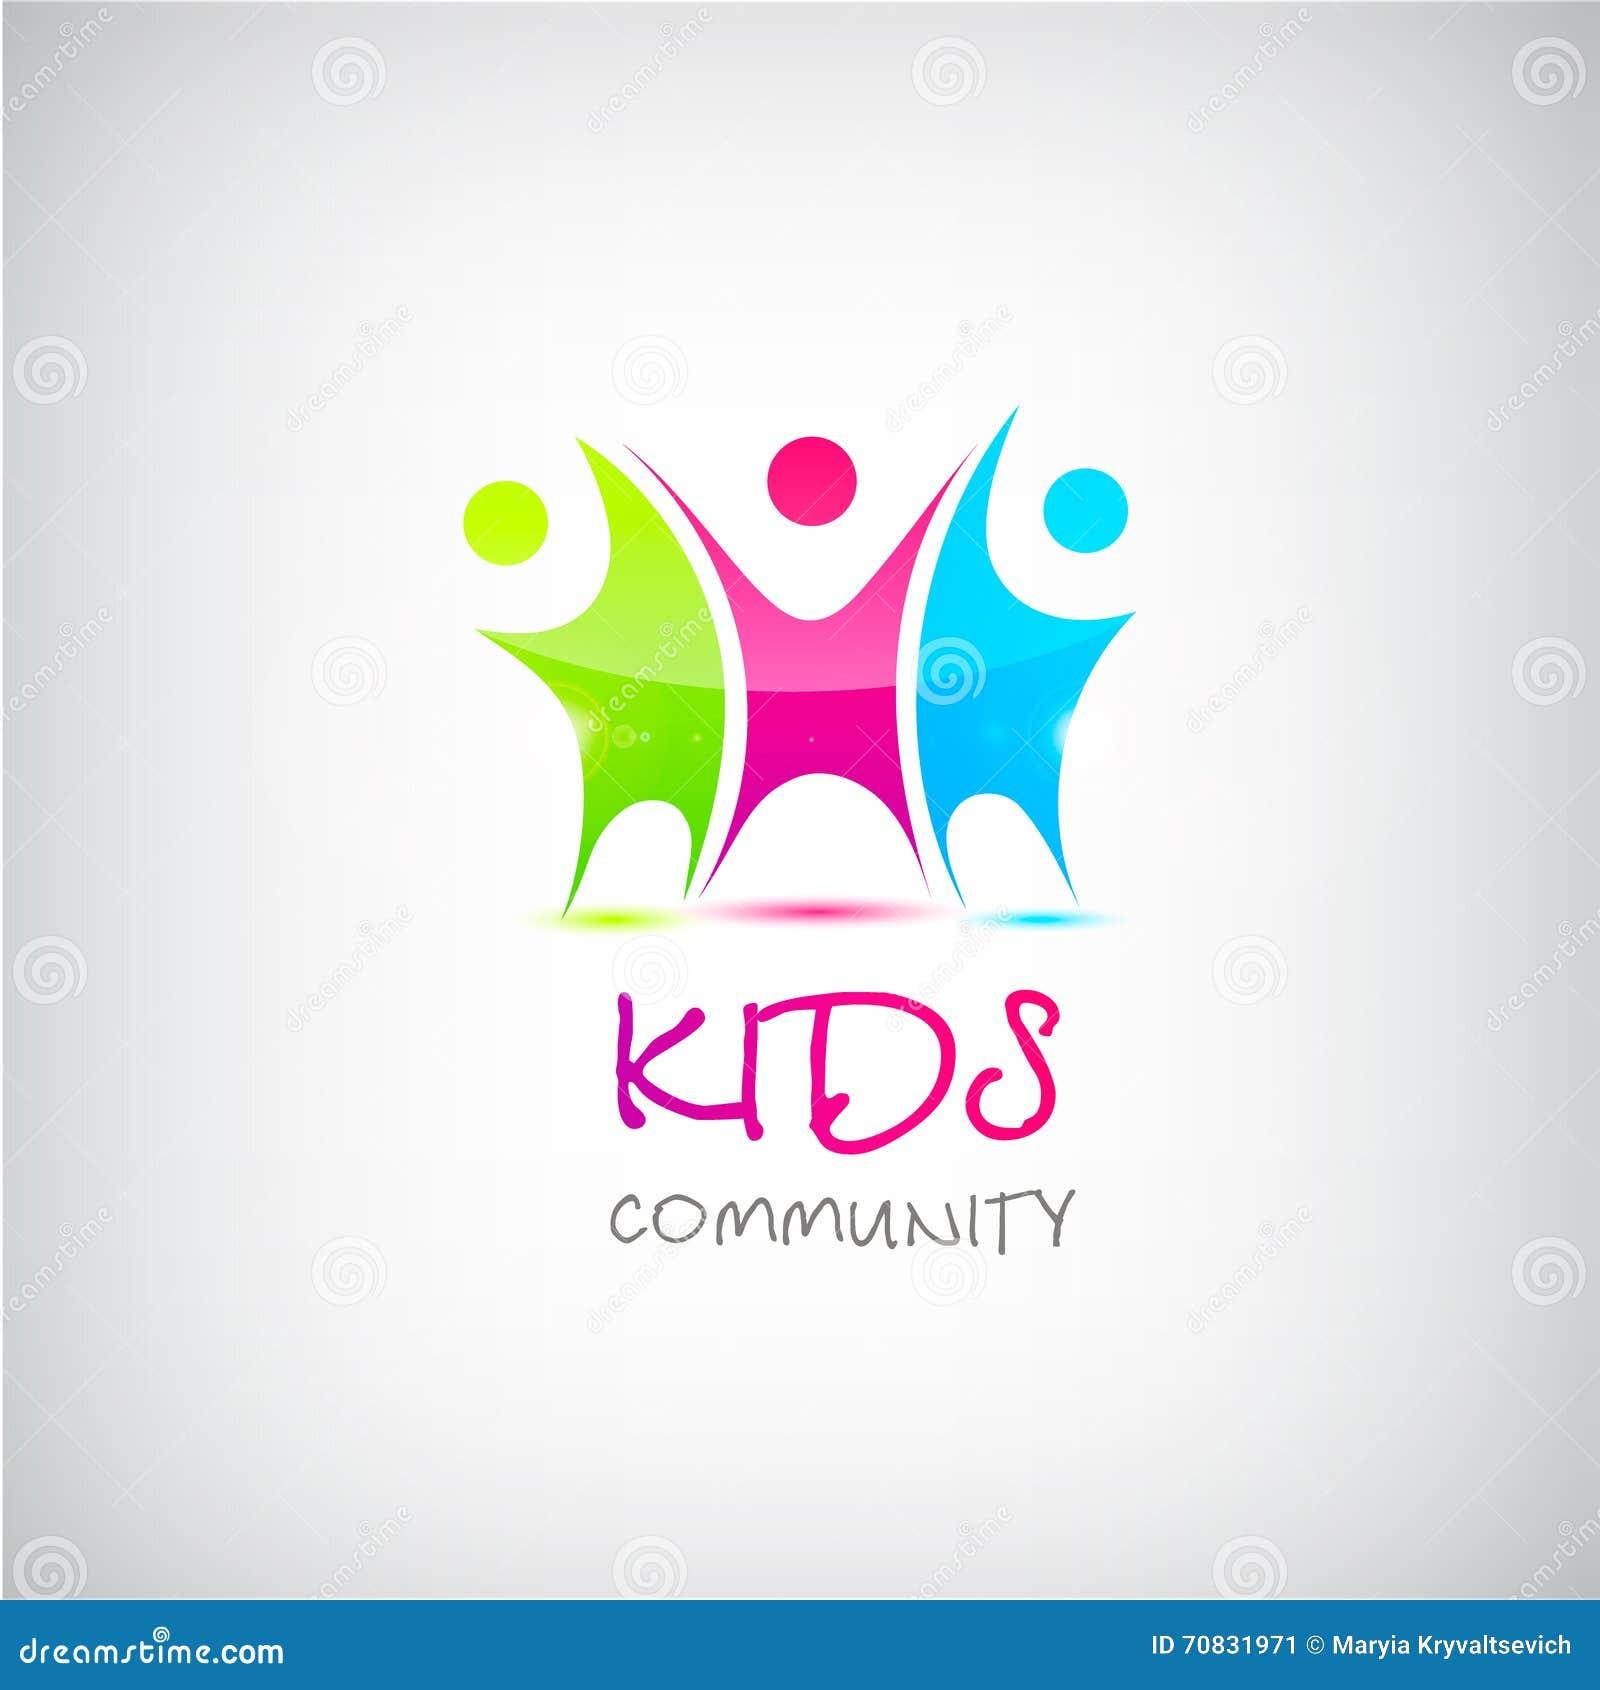 Vector colorful kids logo, children